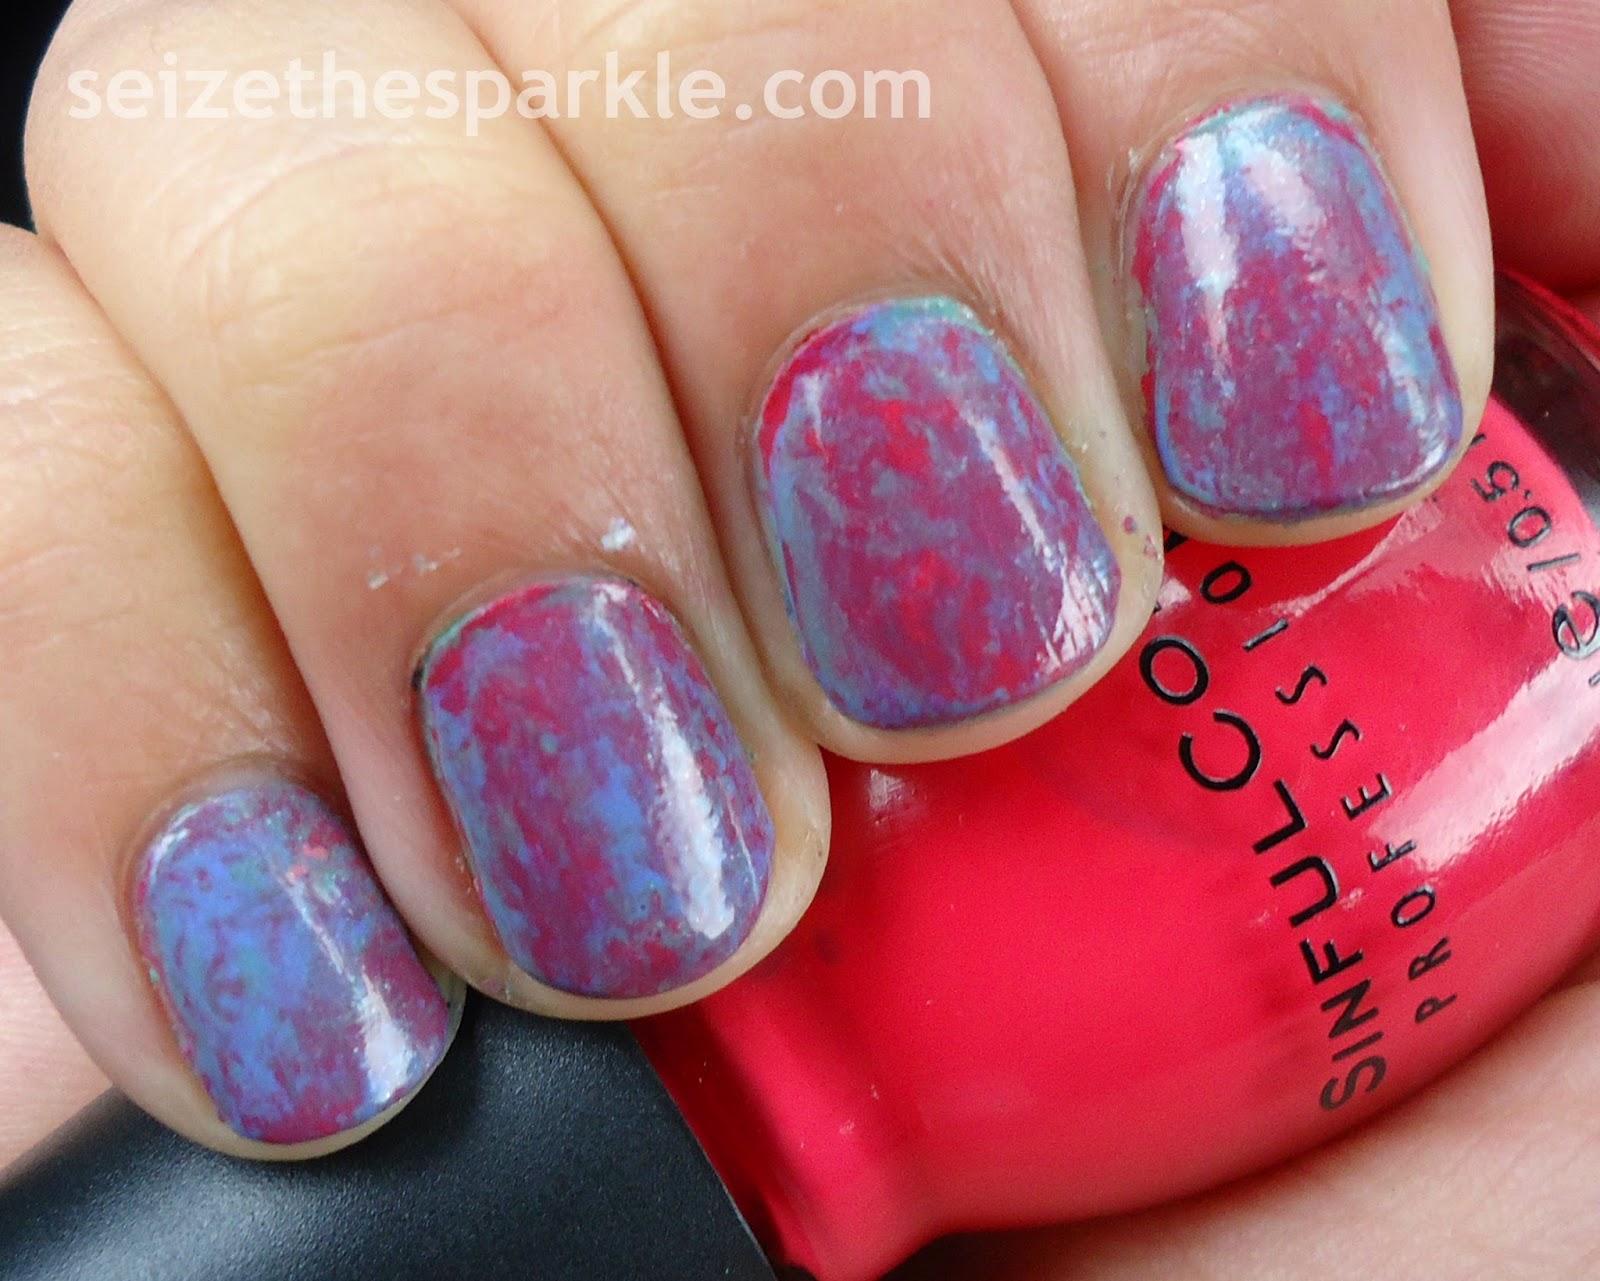 Cling Wrap Manicure